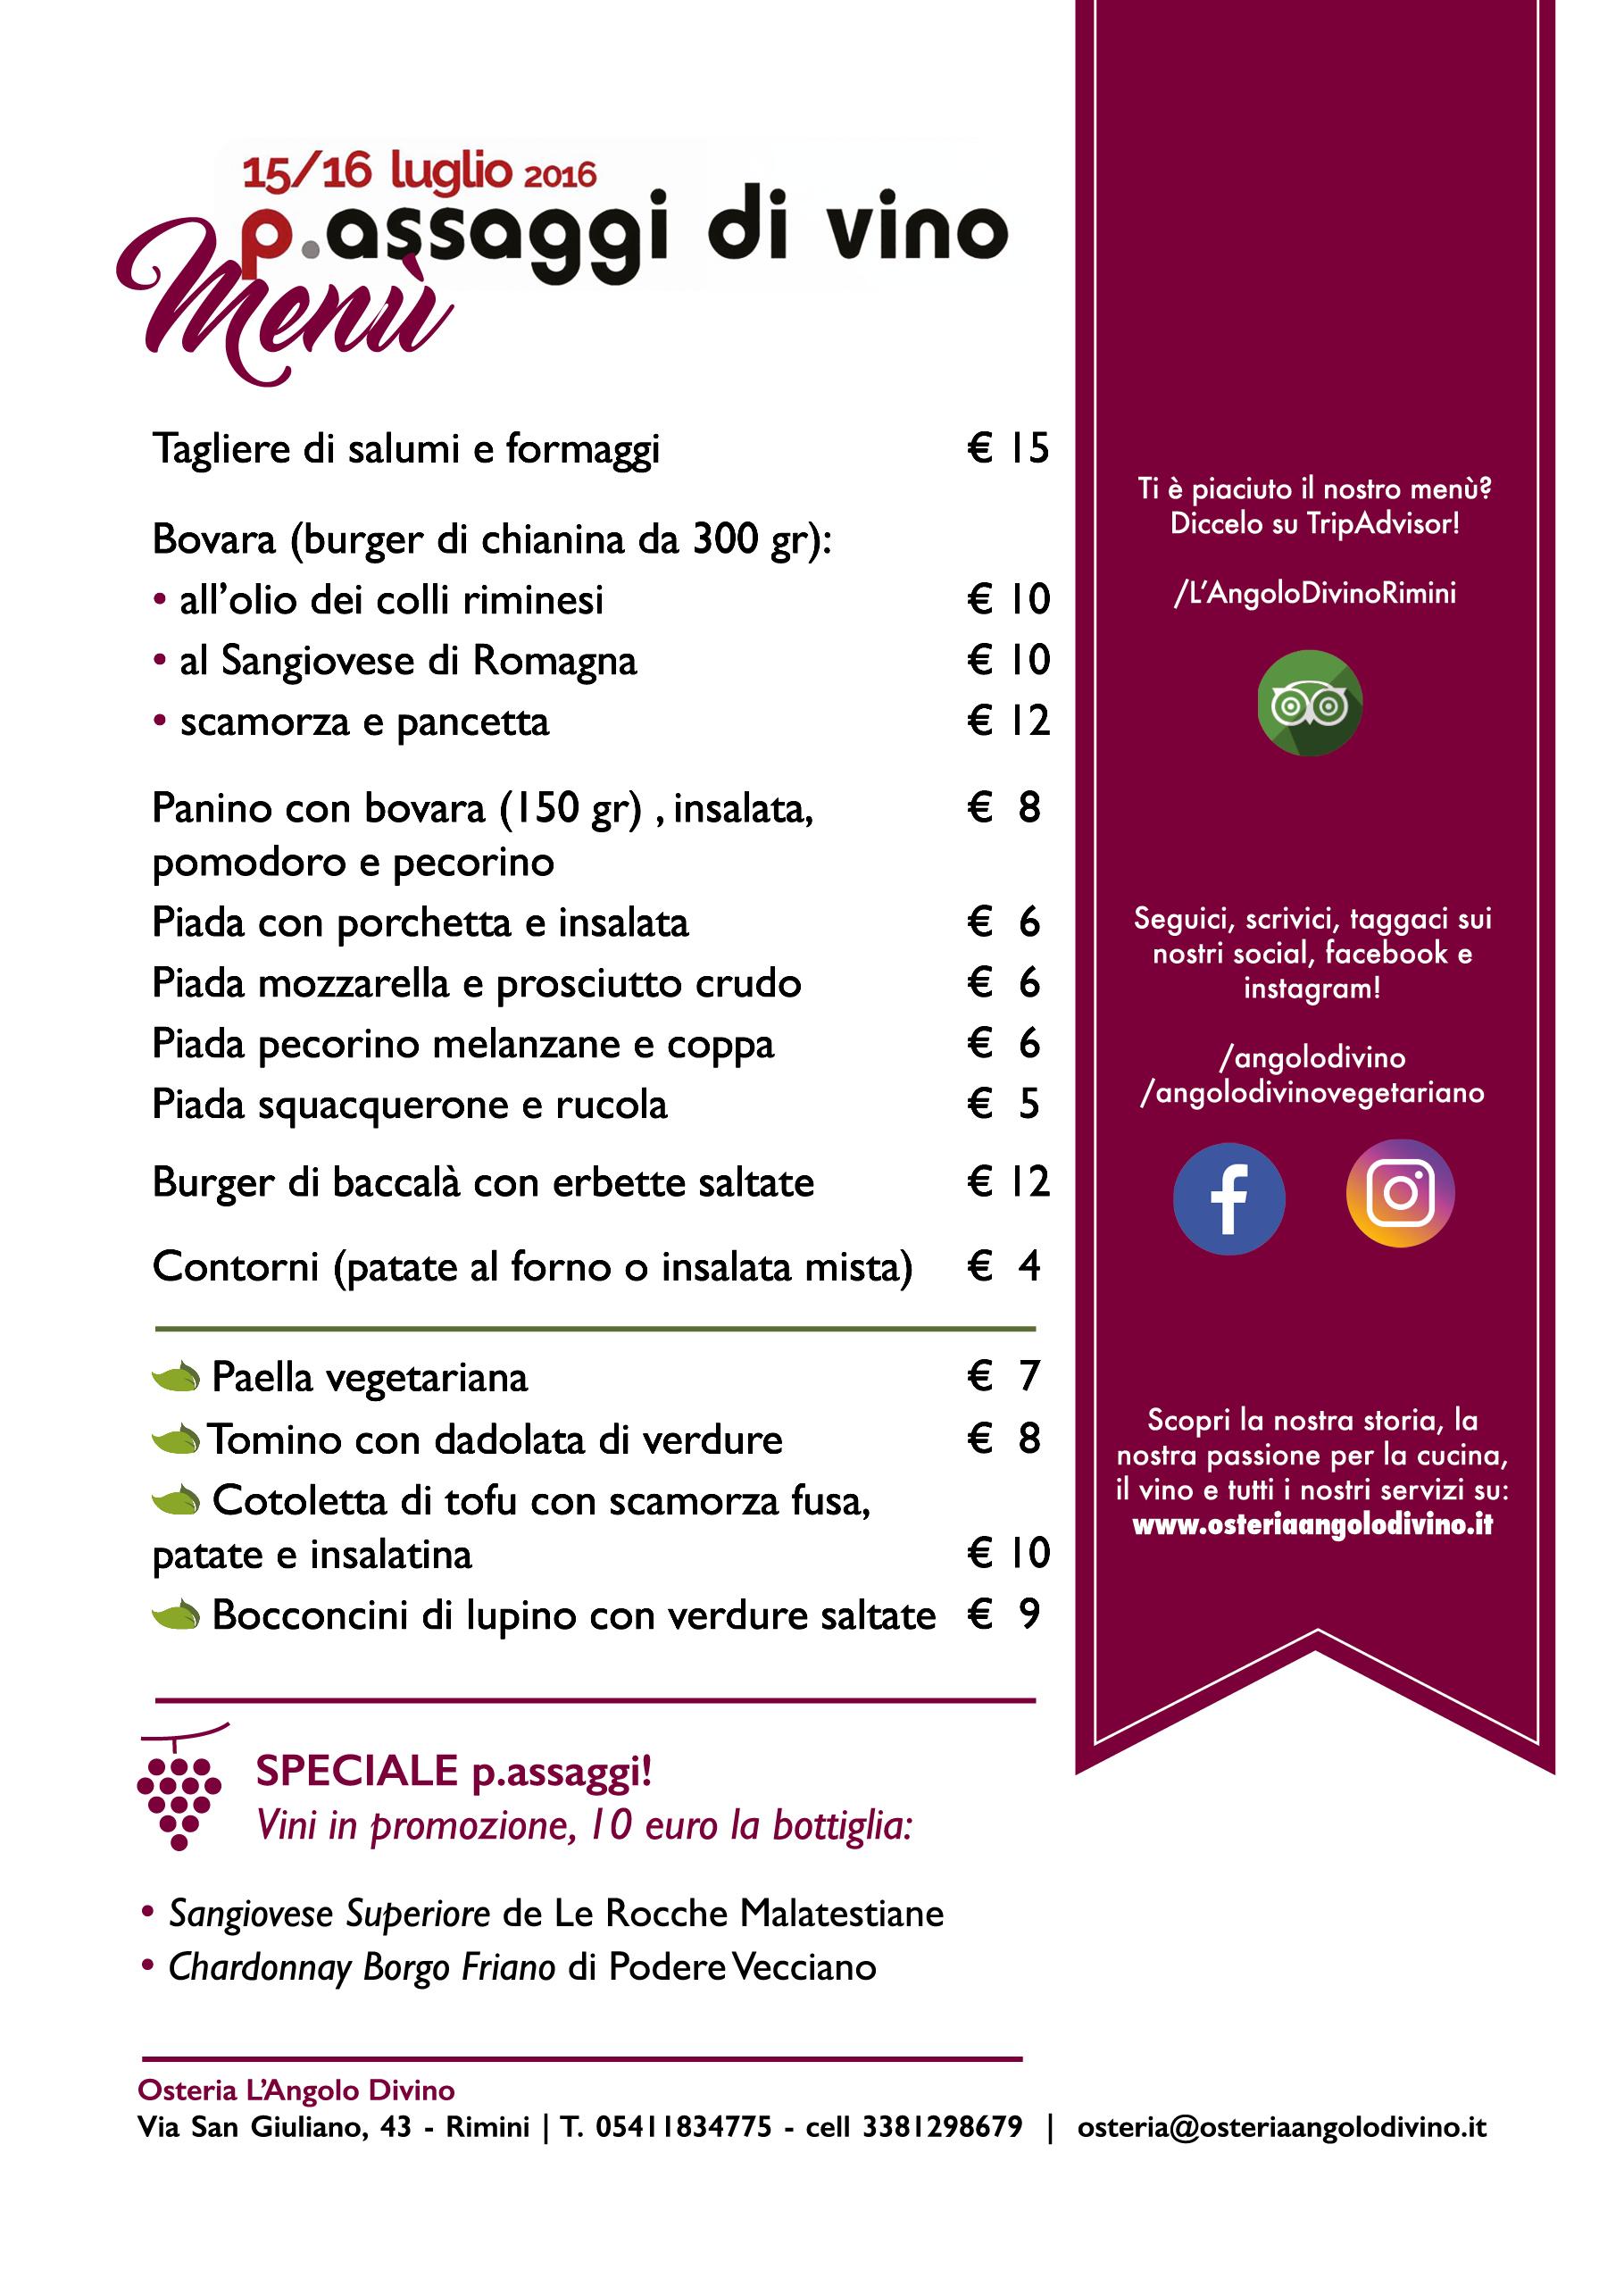 menu_passaggi2016